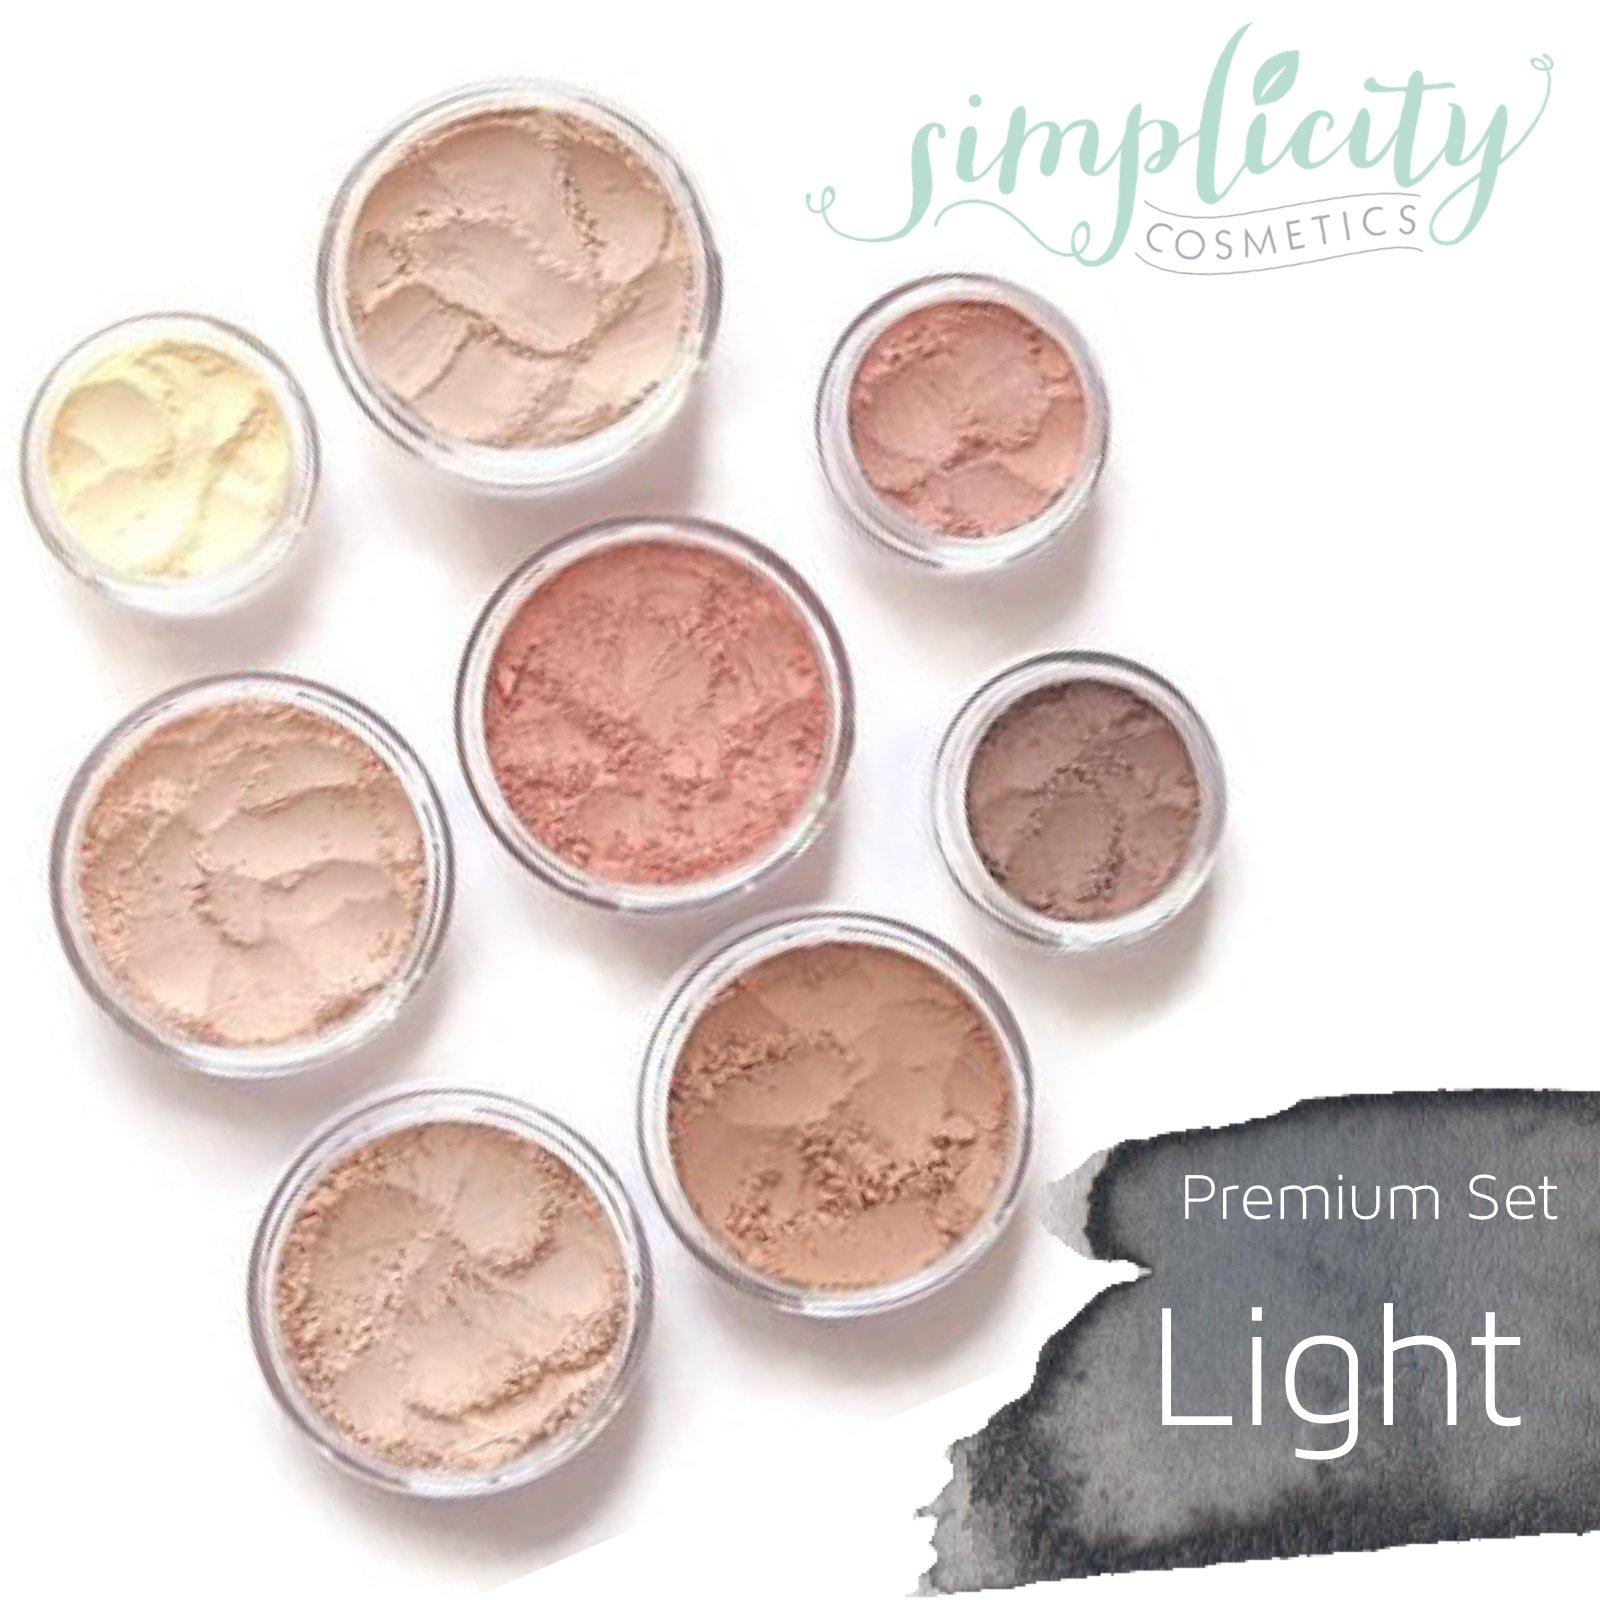 Mineral Makeup Premium Set - Light   Blush   Foundation   Sheer Powder   Eyeshadow   Bronzer   Under Eye Concealer   Starter Set